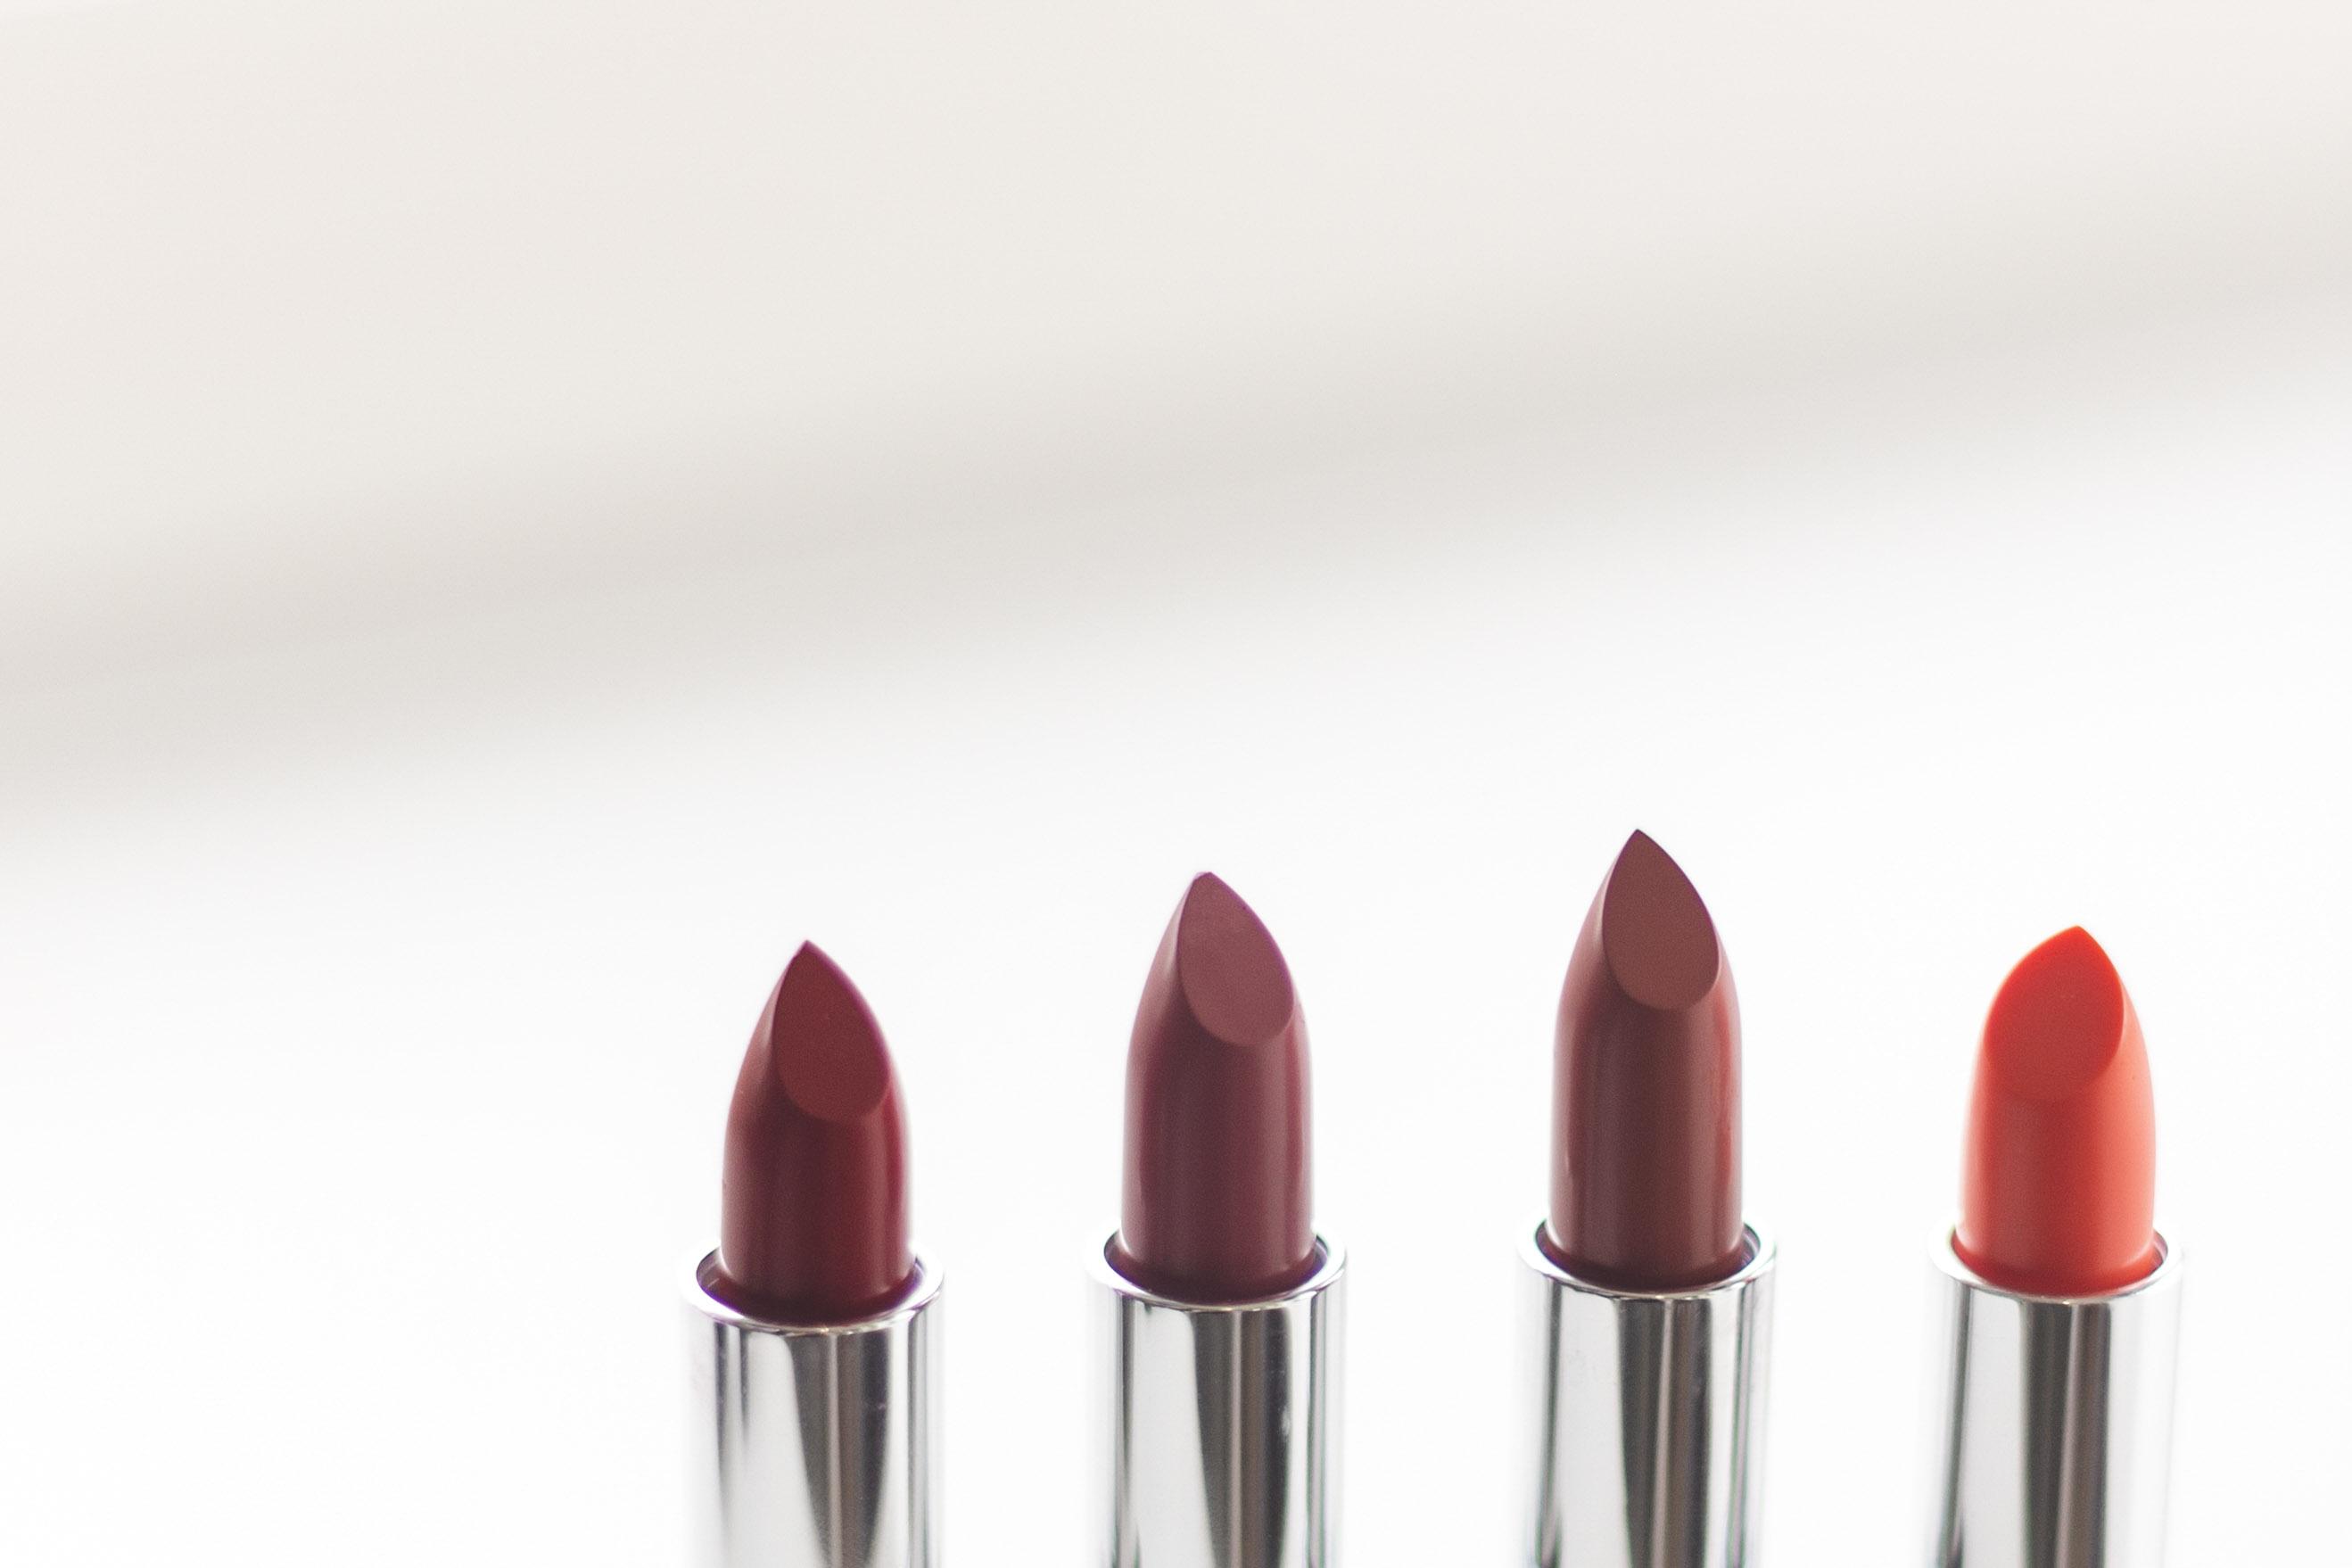 4 Lipsticks, Baby! (all Four Shades)